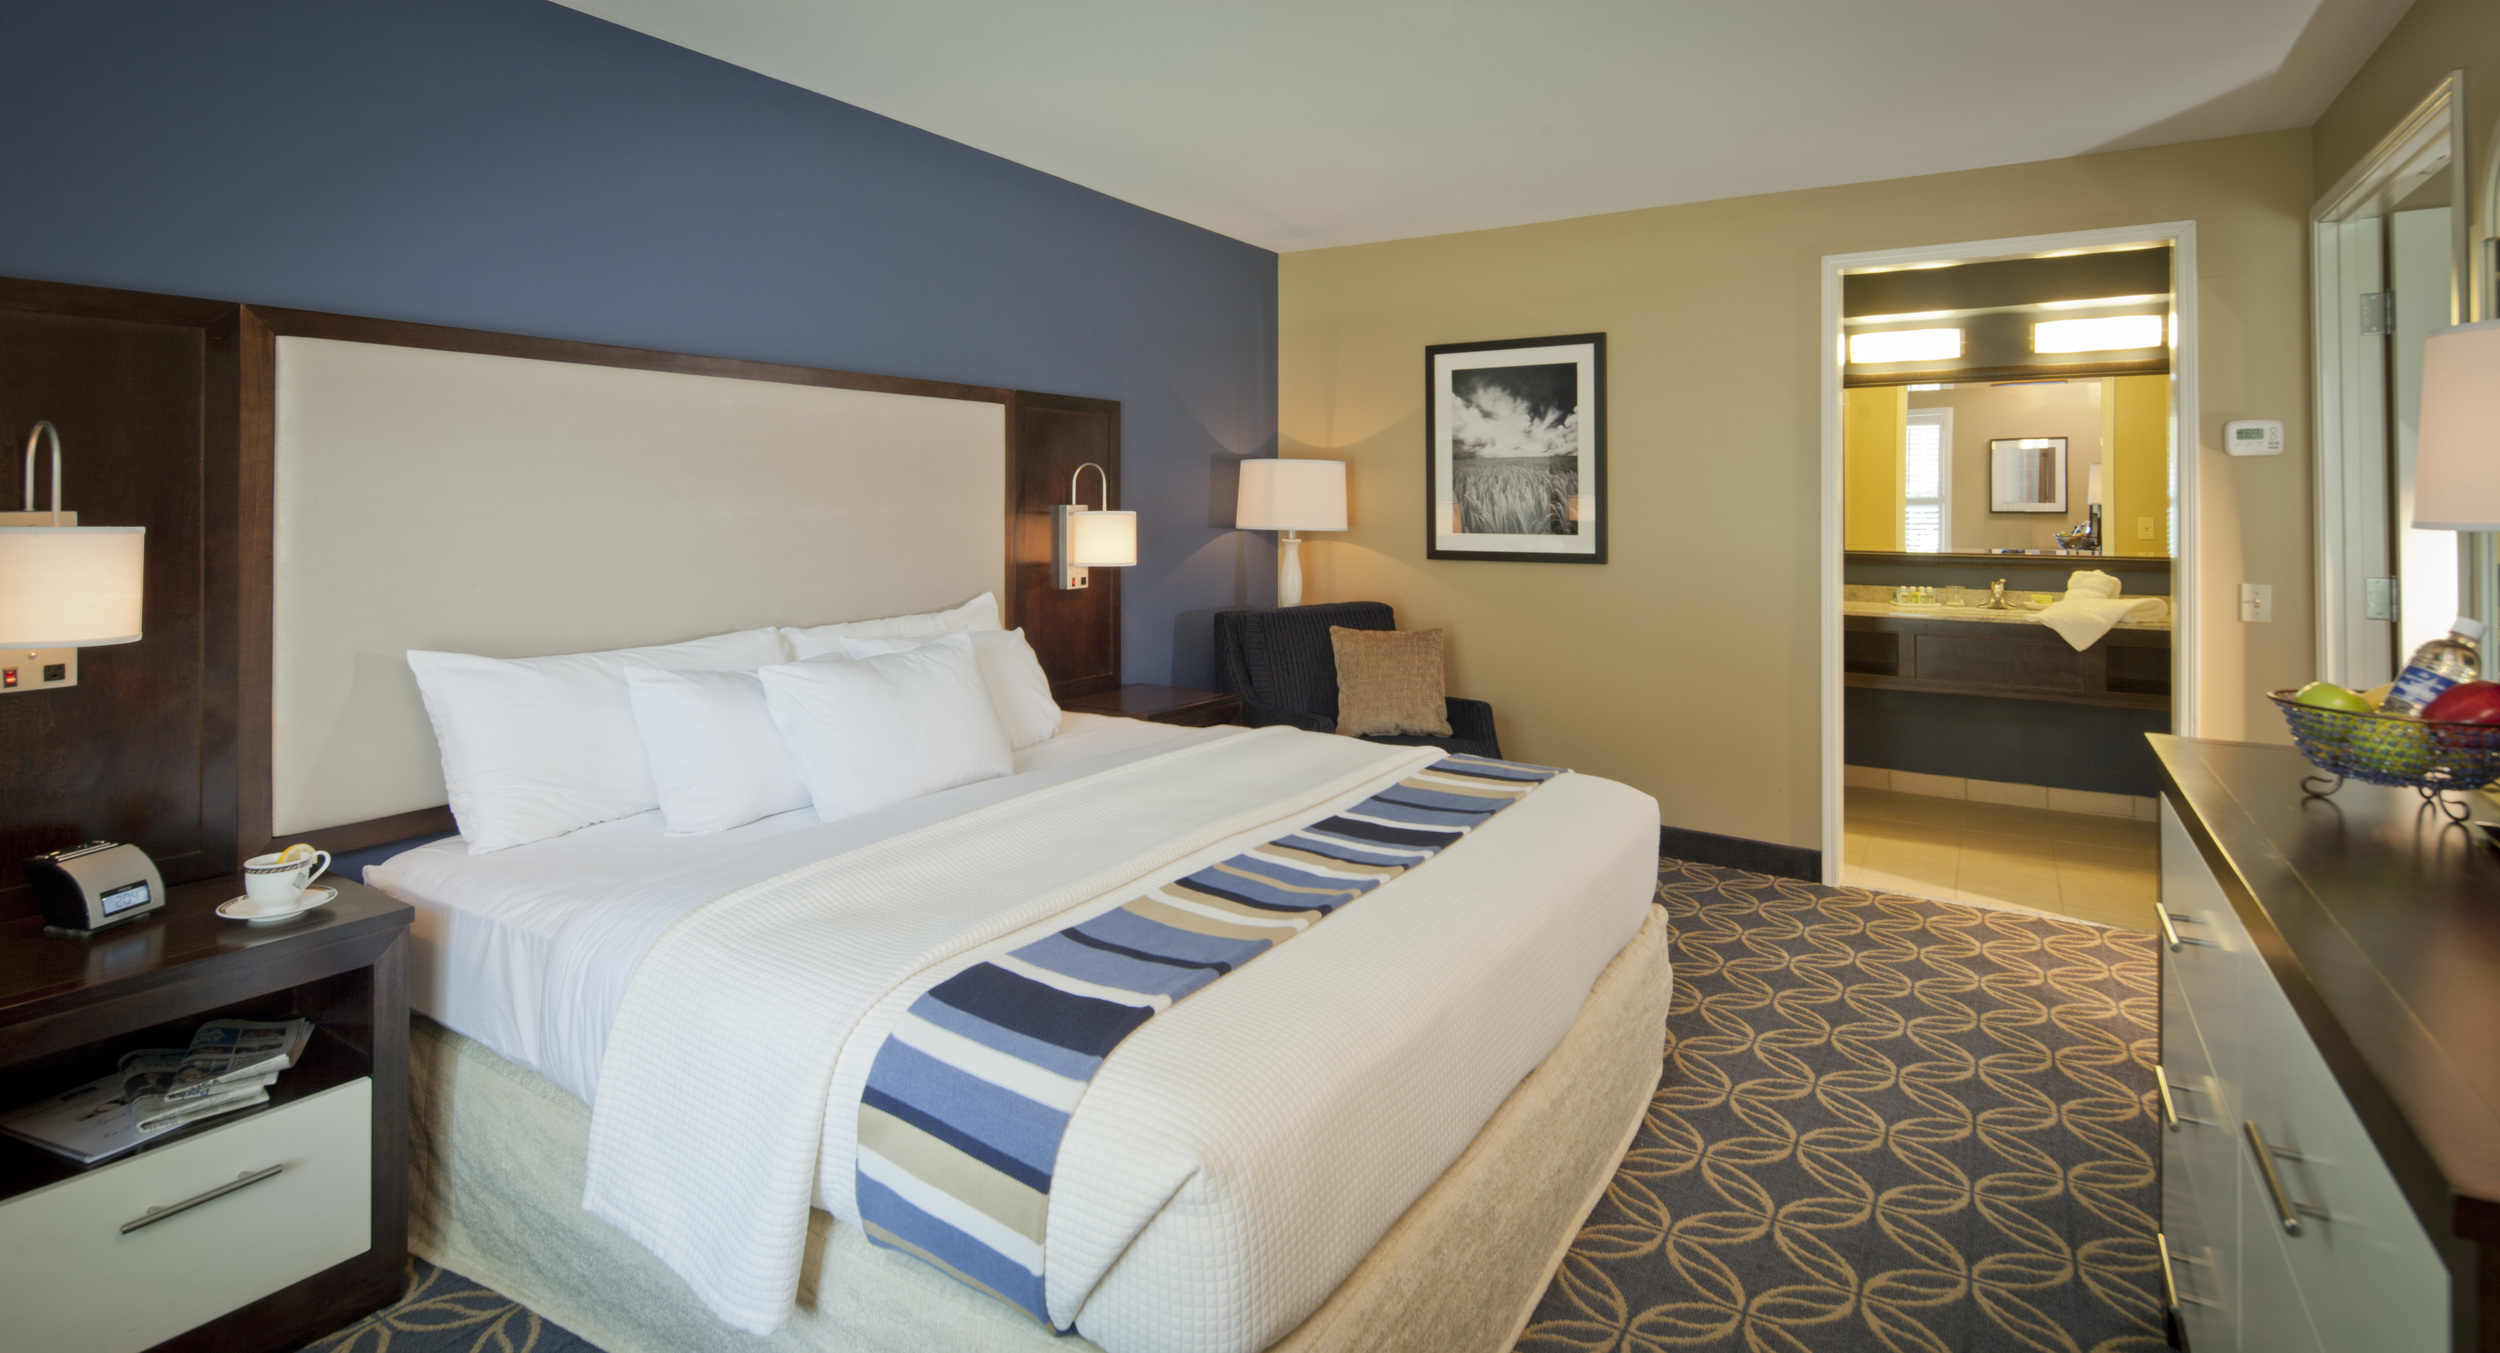 hotel-king parlor room 120615_0683.jpg